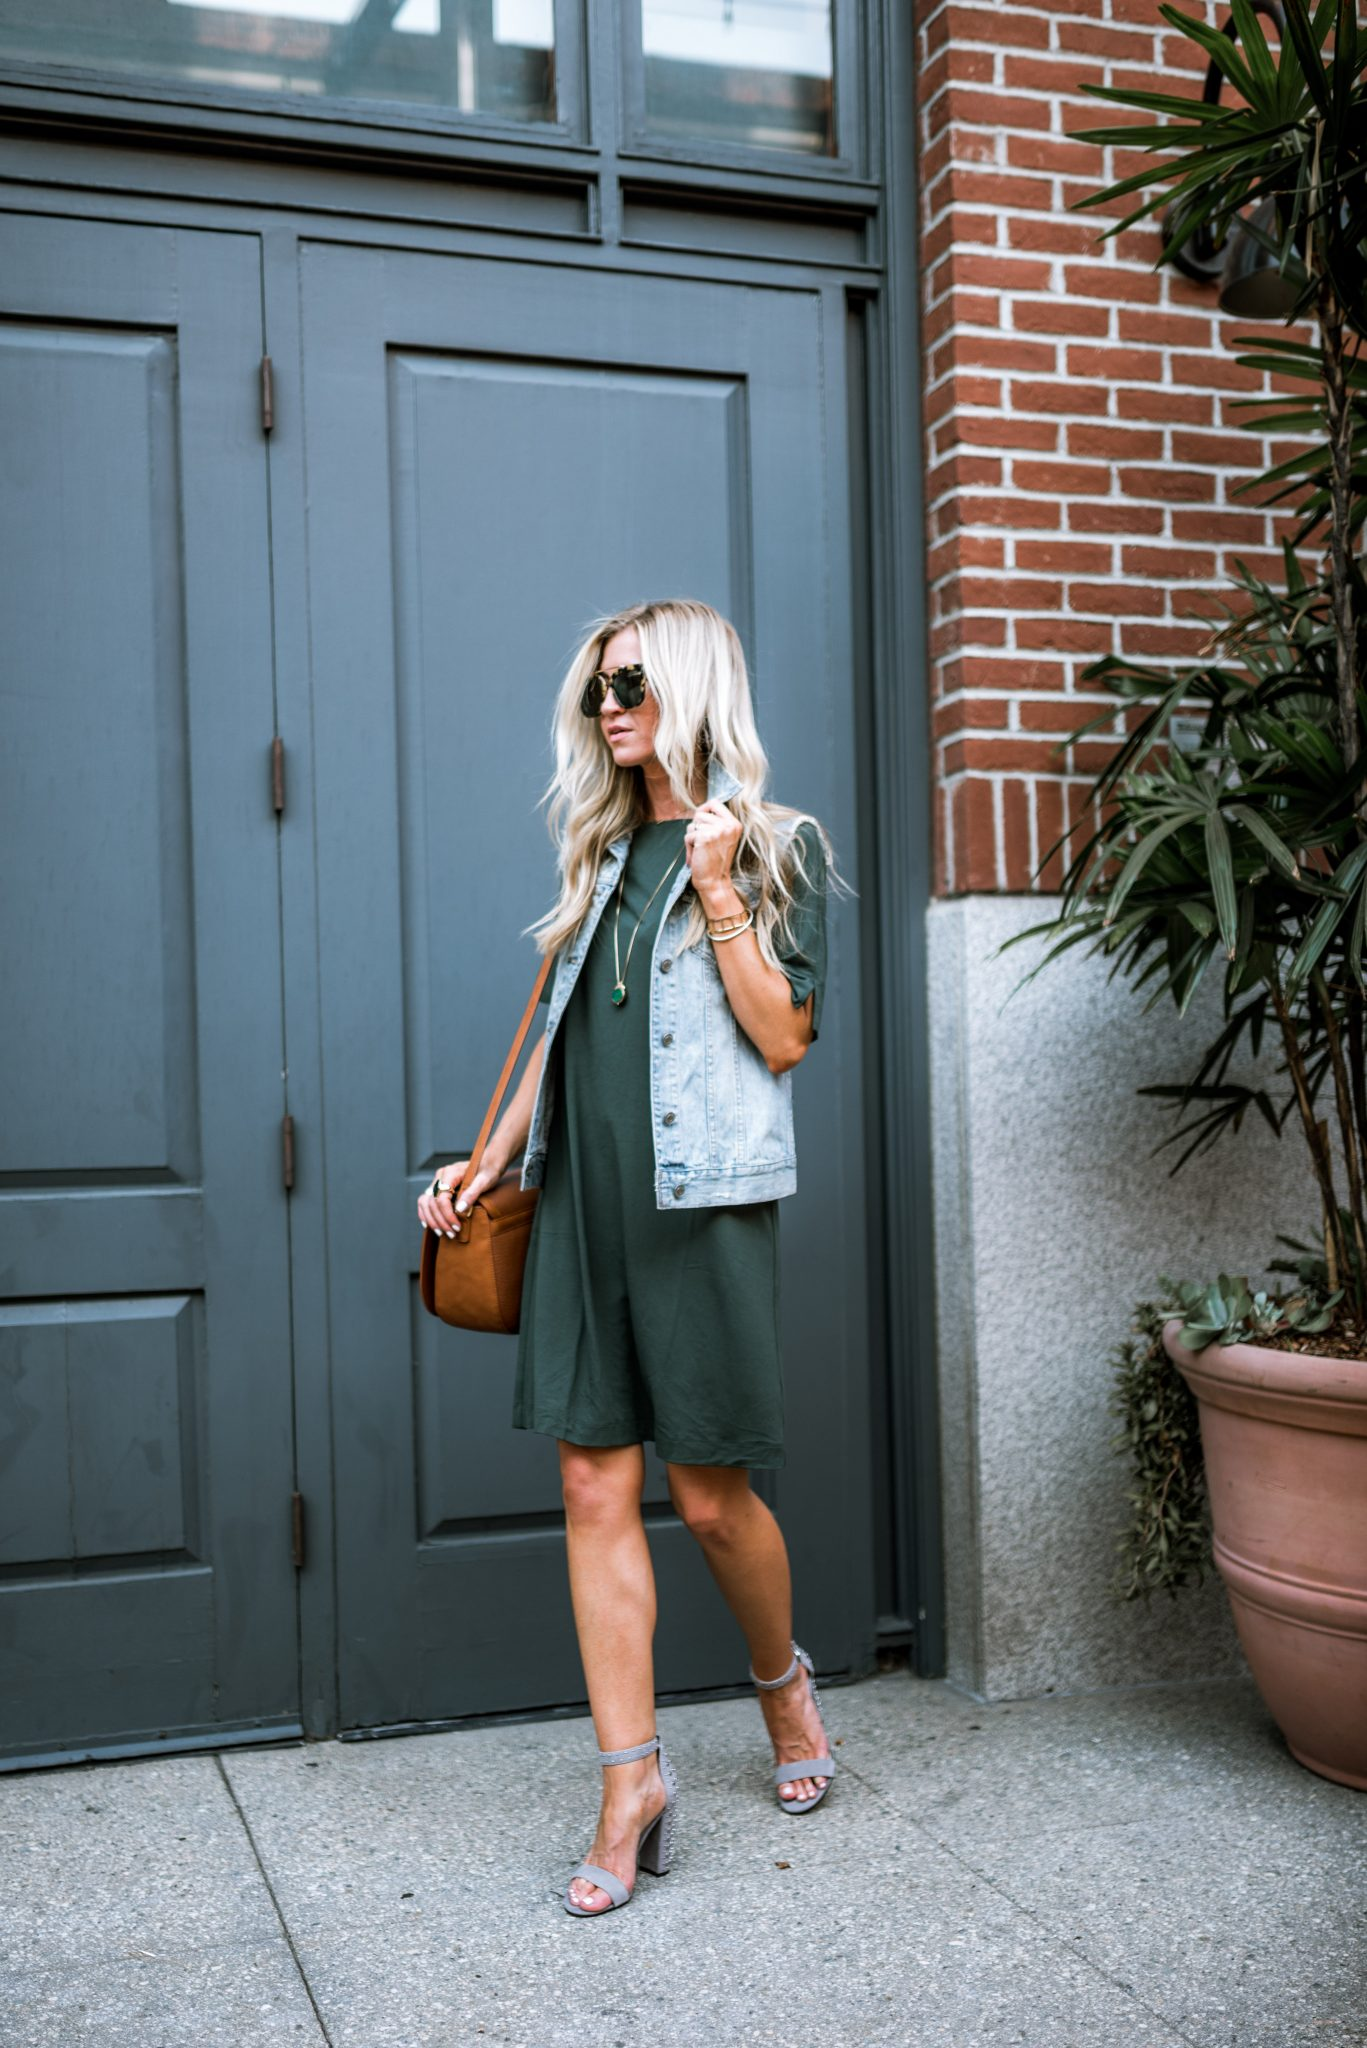 Olive swing dress + distressed denim vest.